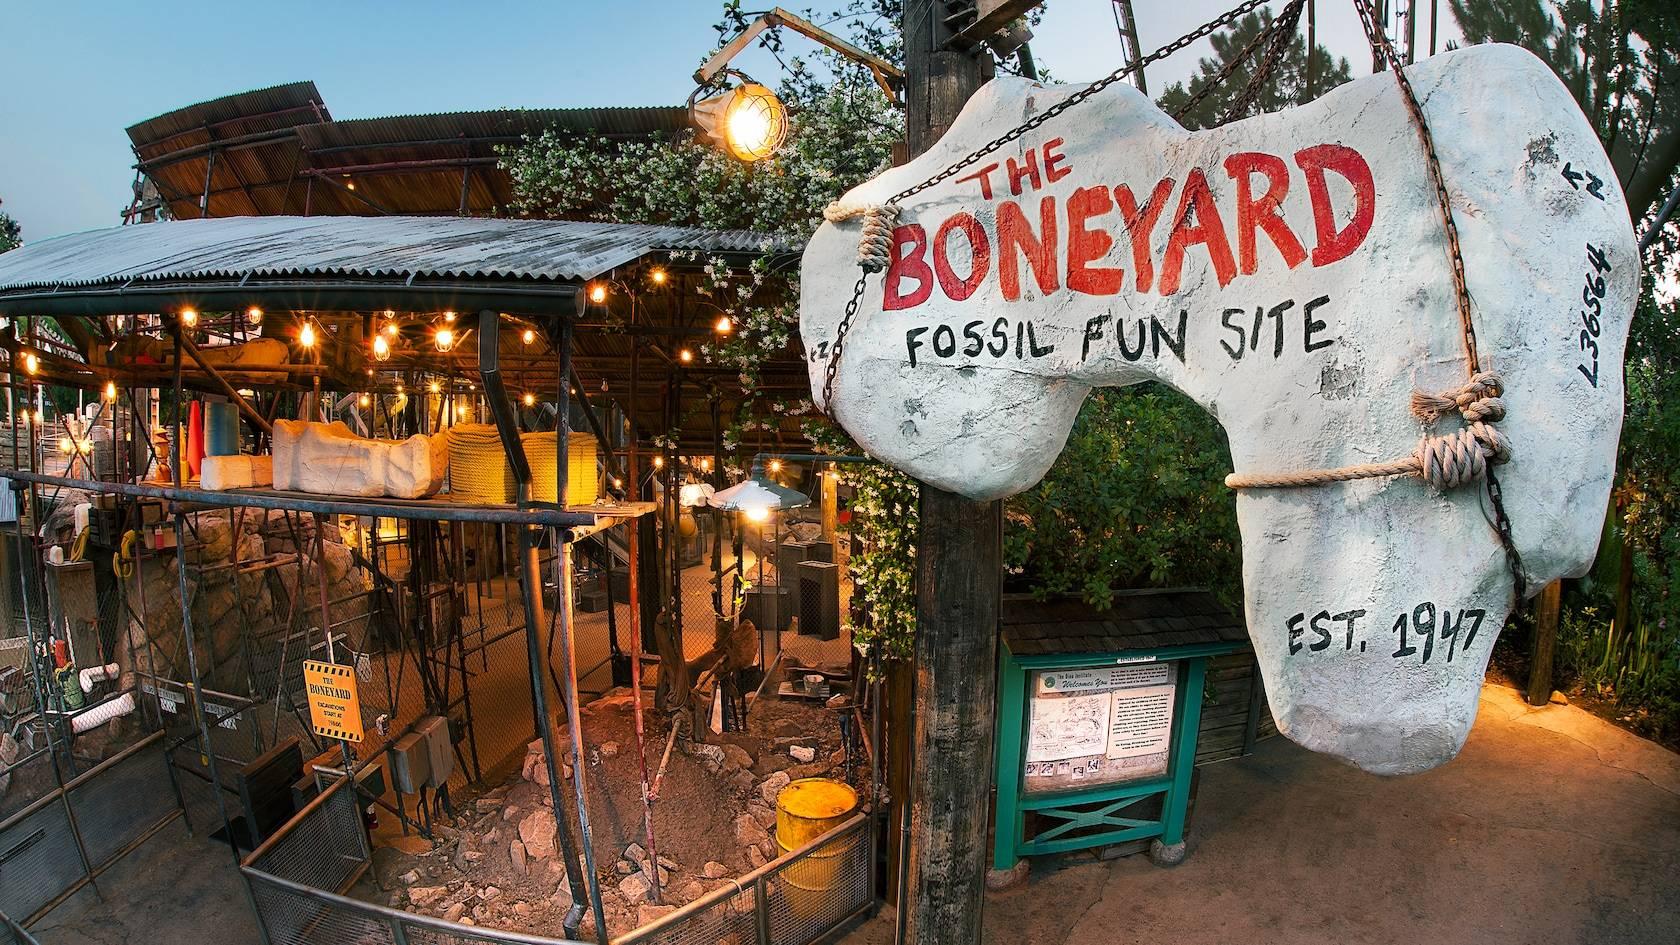 The Boneyard overview